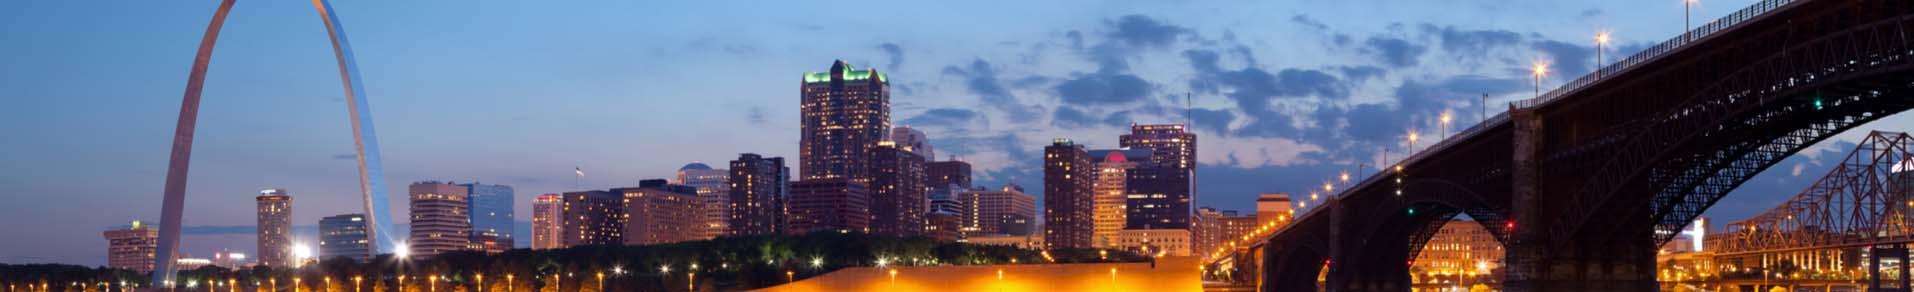 St-Louis-Skyline image